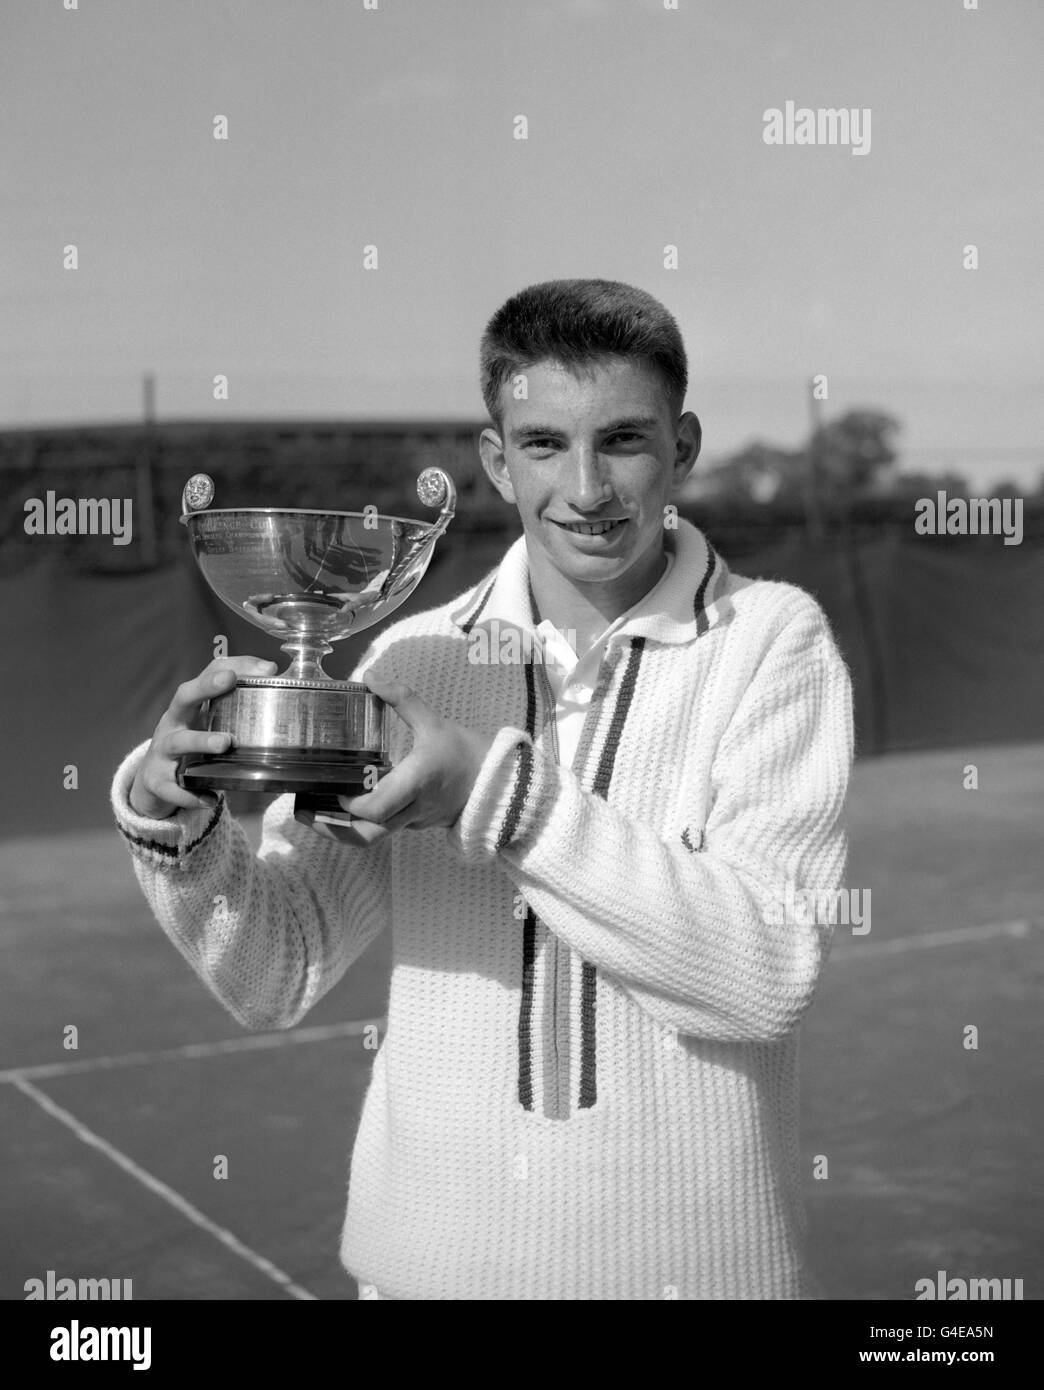 Tennis - Junior Championships of Great Britain - Boy's Singles - Wimbledon - Stock Image